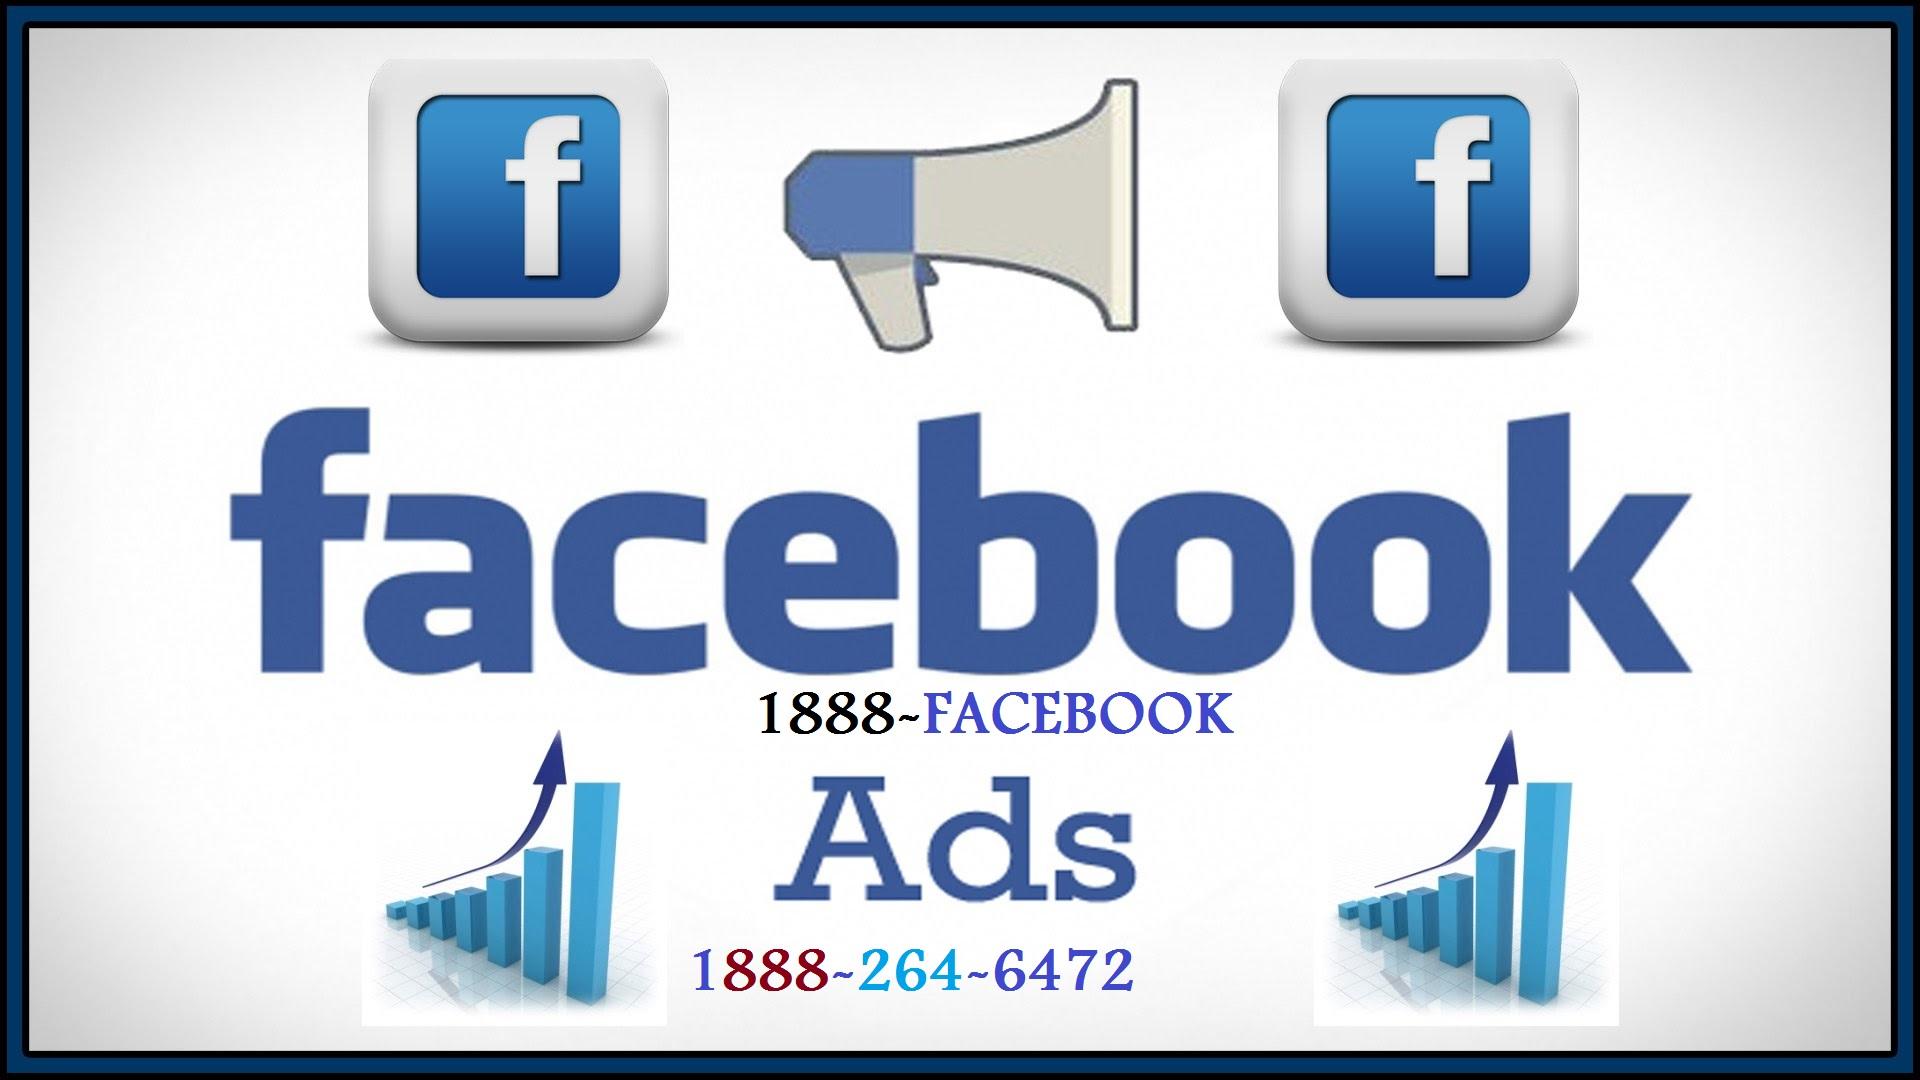 facebook helpline number 1888-828-4852 facebook contact phone number